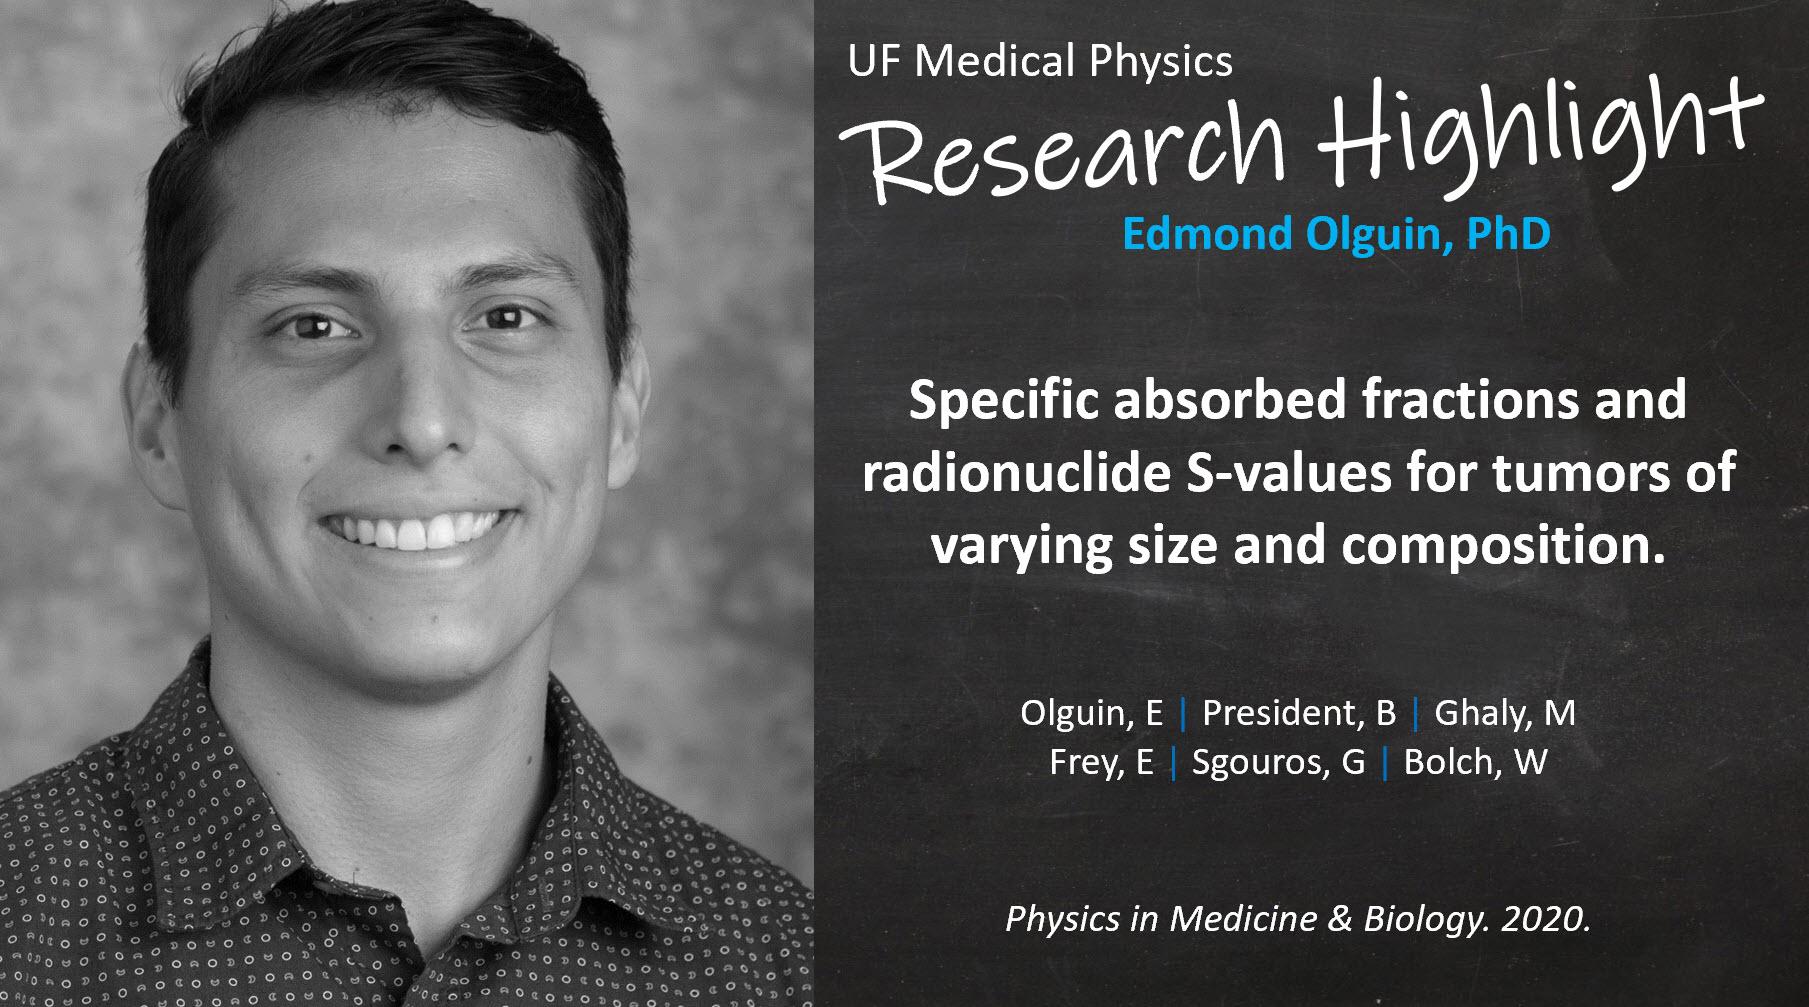 Research Highlight - Dr Edmond Olguin